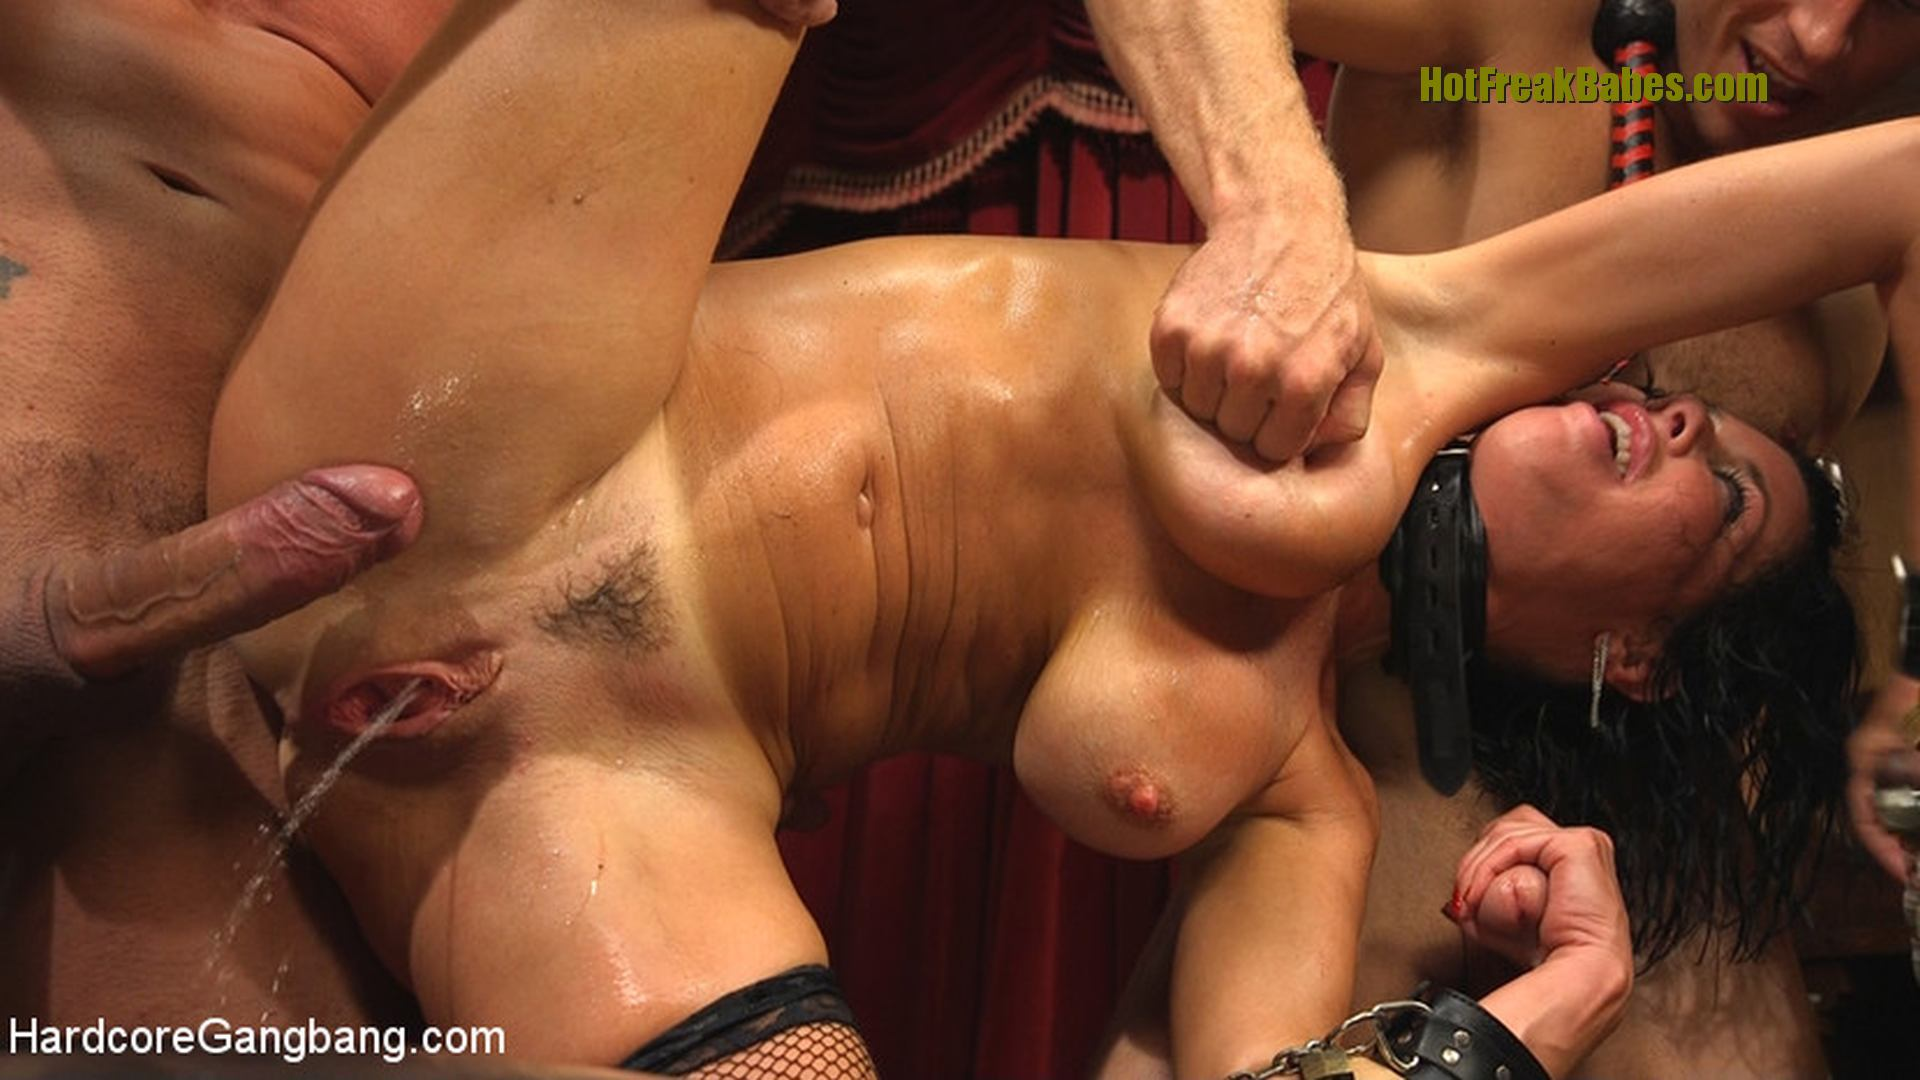 Girls wrestling men nude